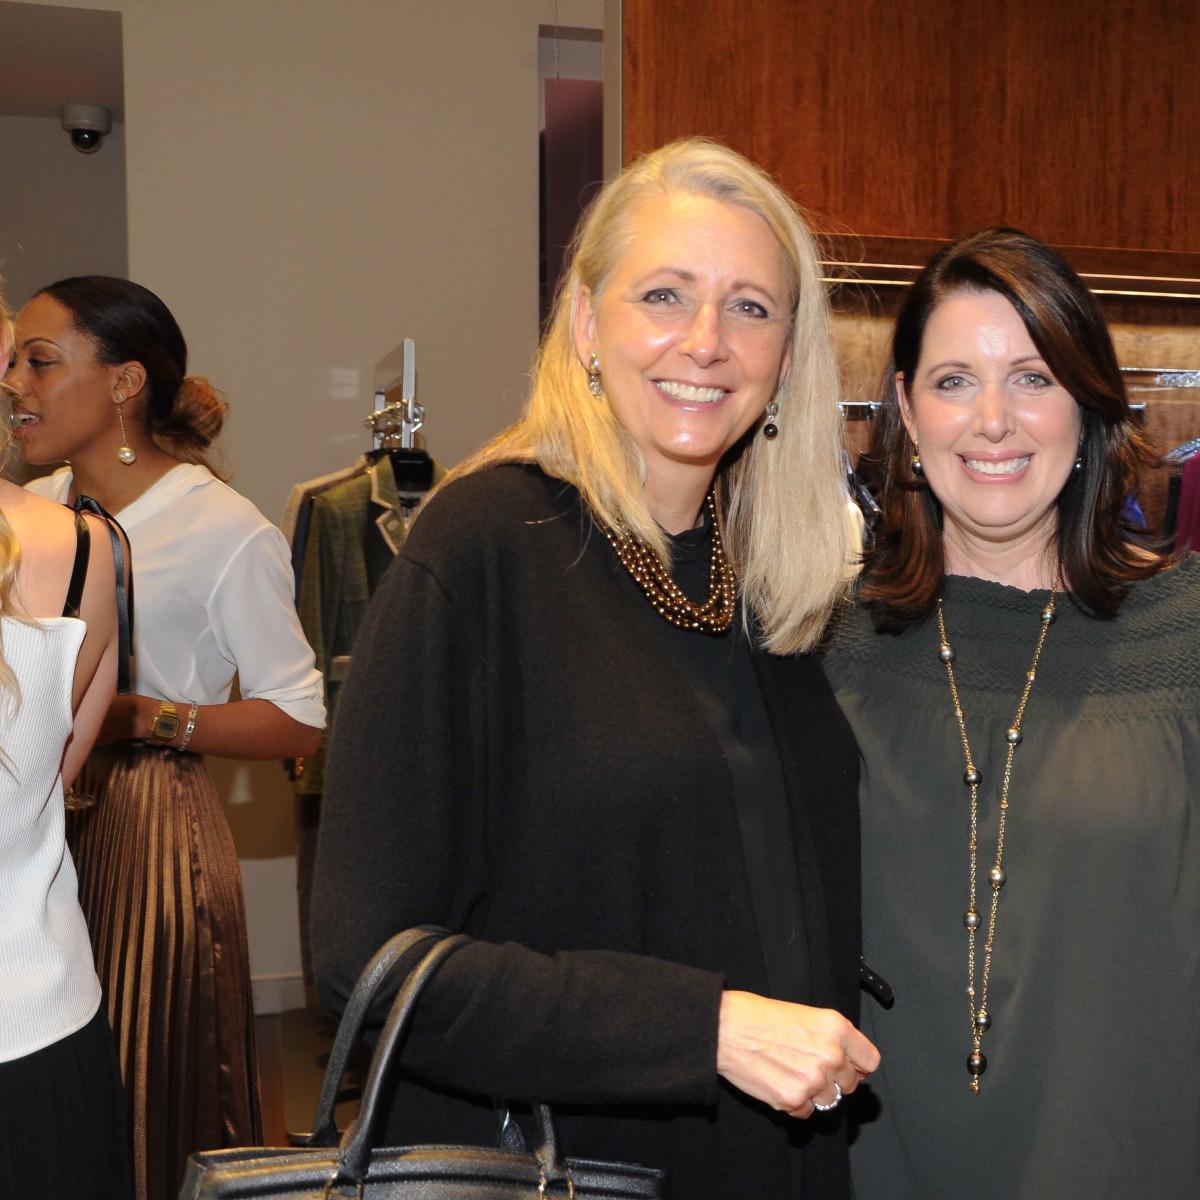 Tyler Ellis event, Elaine Stolte, Julie Roberts